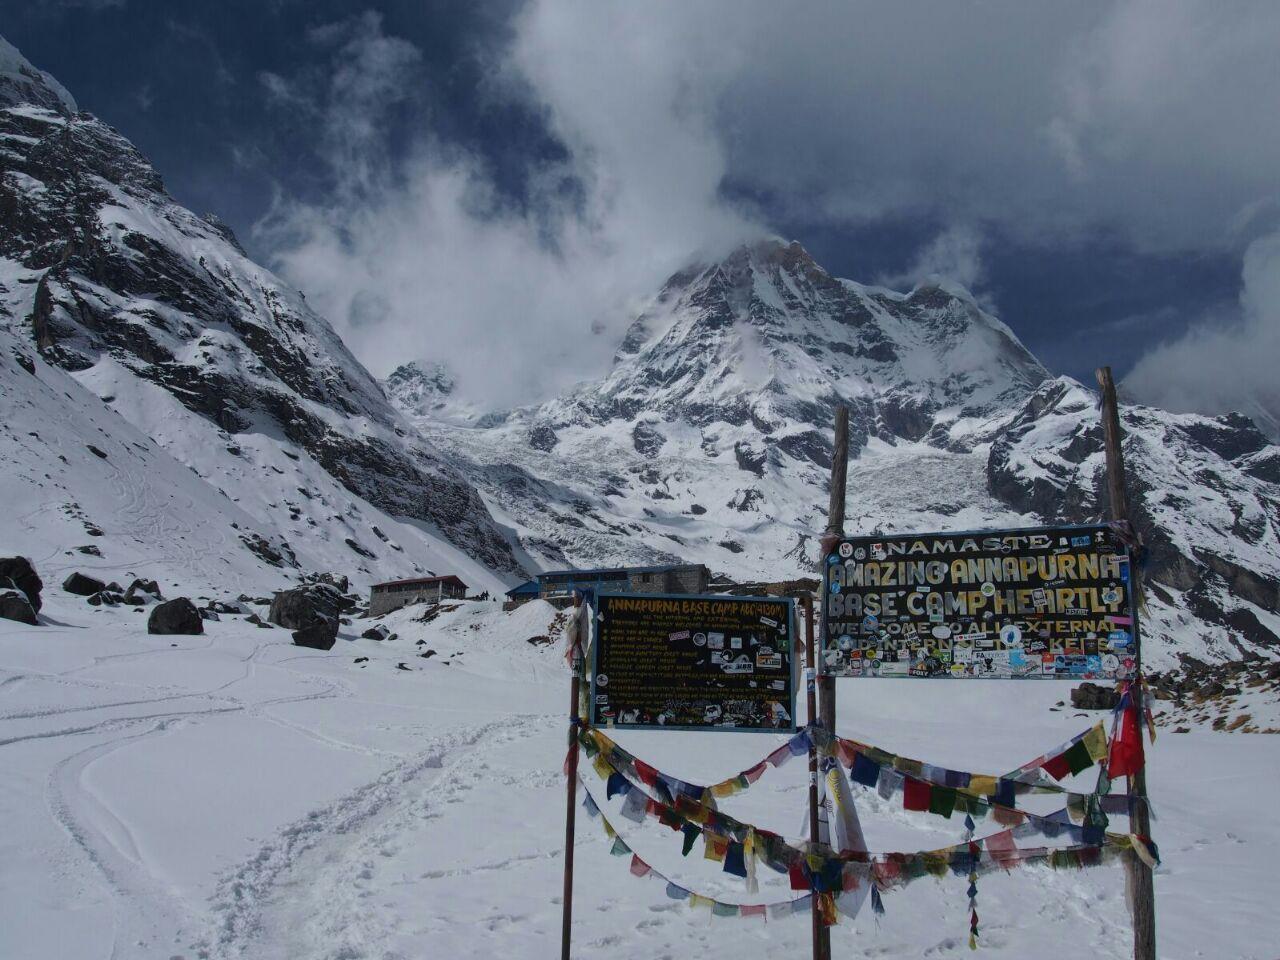 Trekking do Annapurna Base Camp i Mardi Himal Base Camp